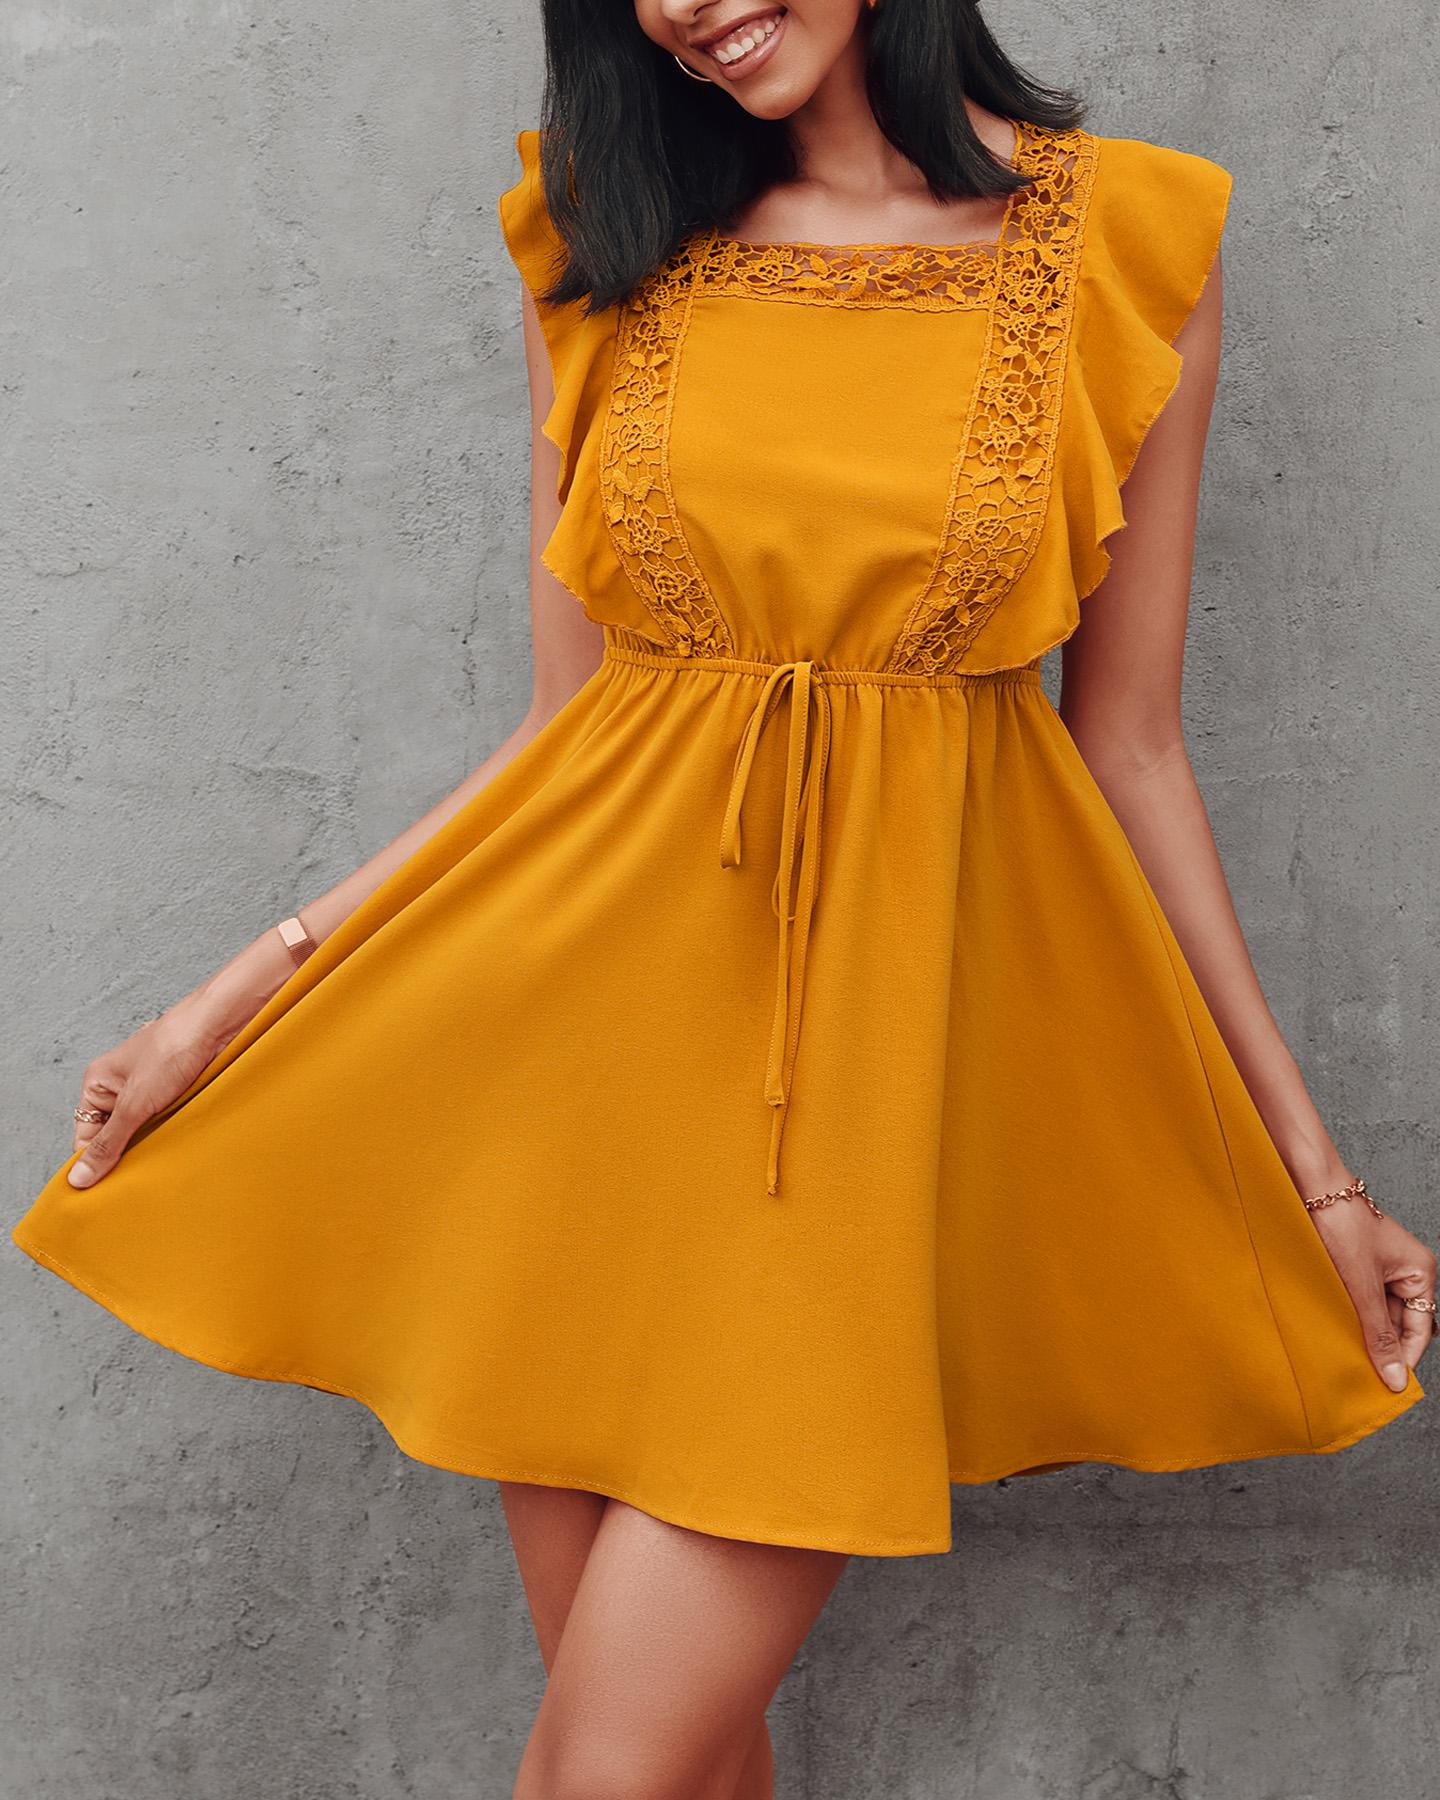 Lace Patch Ruffles Drawstring Casual Dress, Yellow